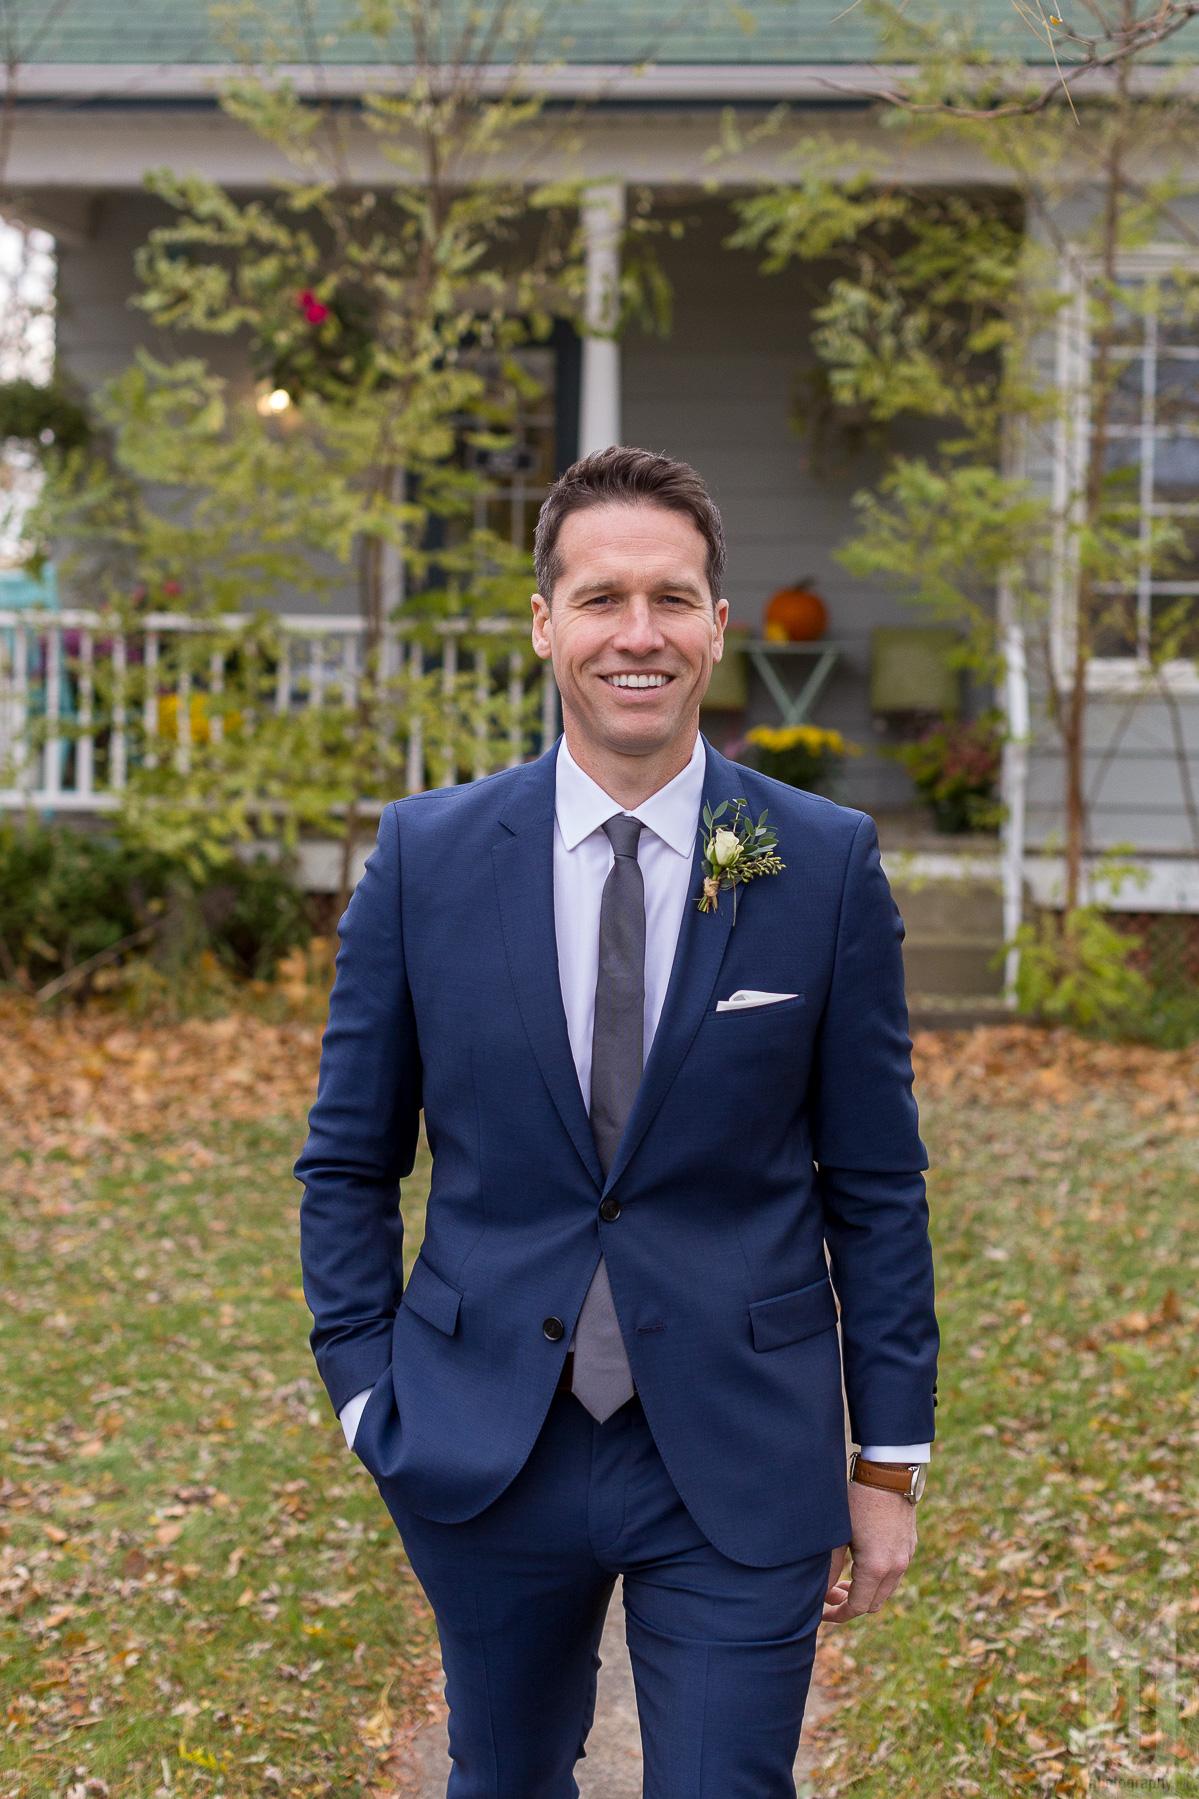 RL_Wedding_Tall-1.jpg